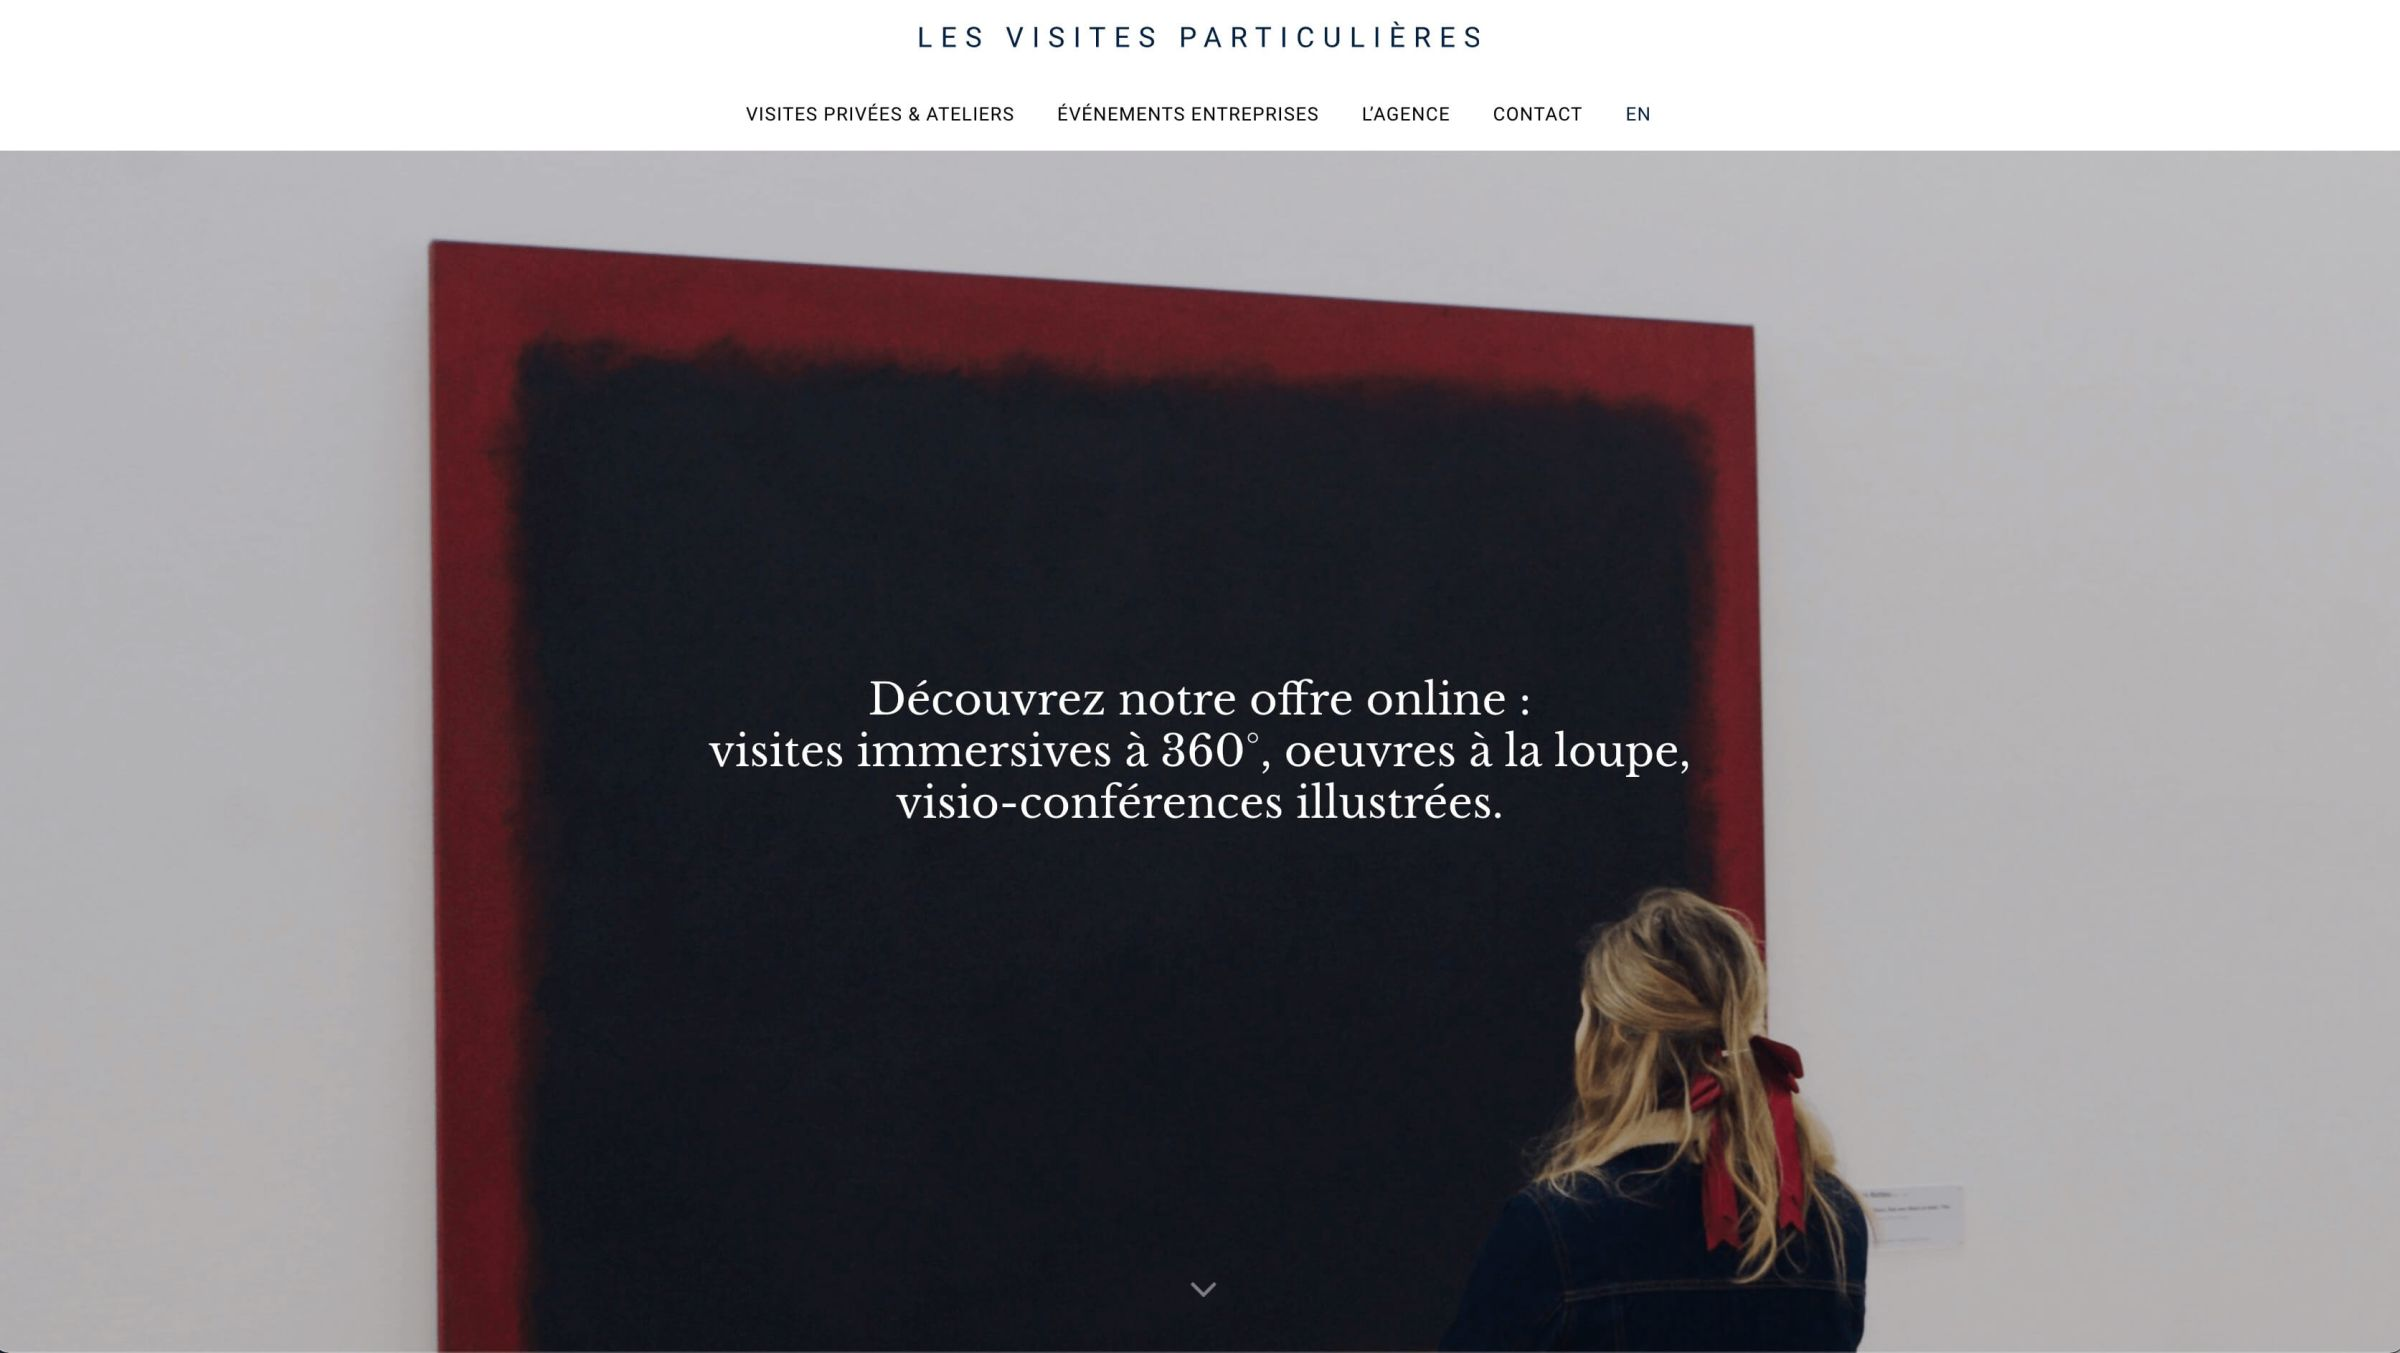 lesvisitesparticulieres-website-screenshot